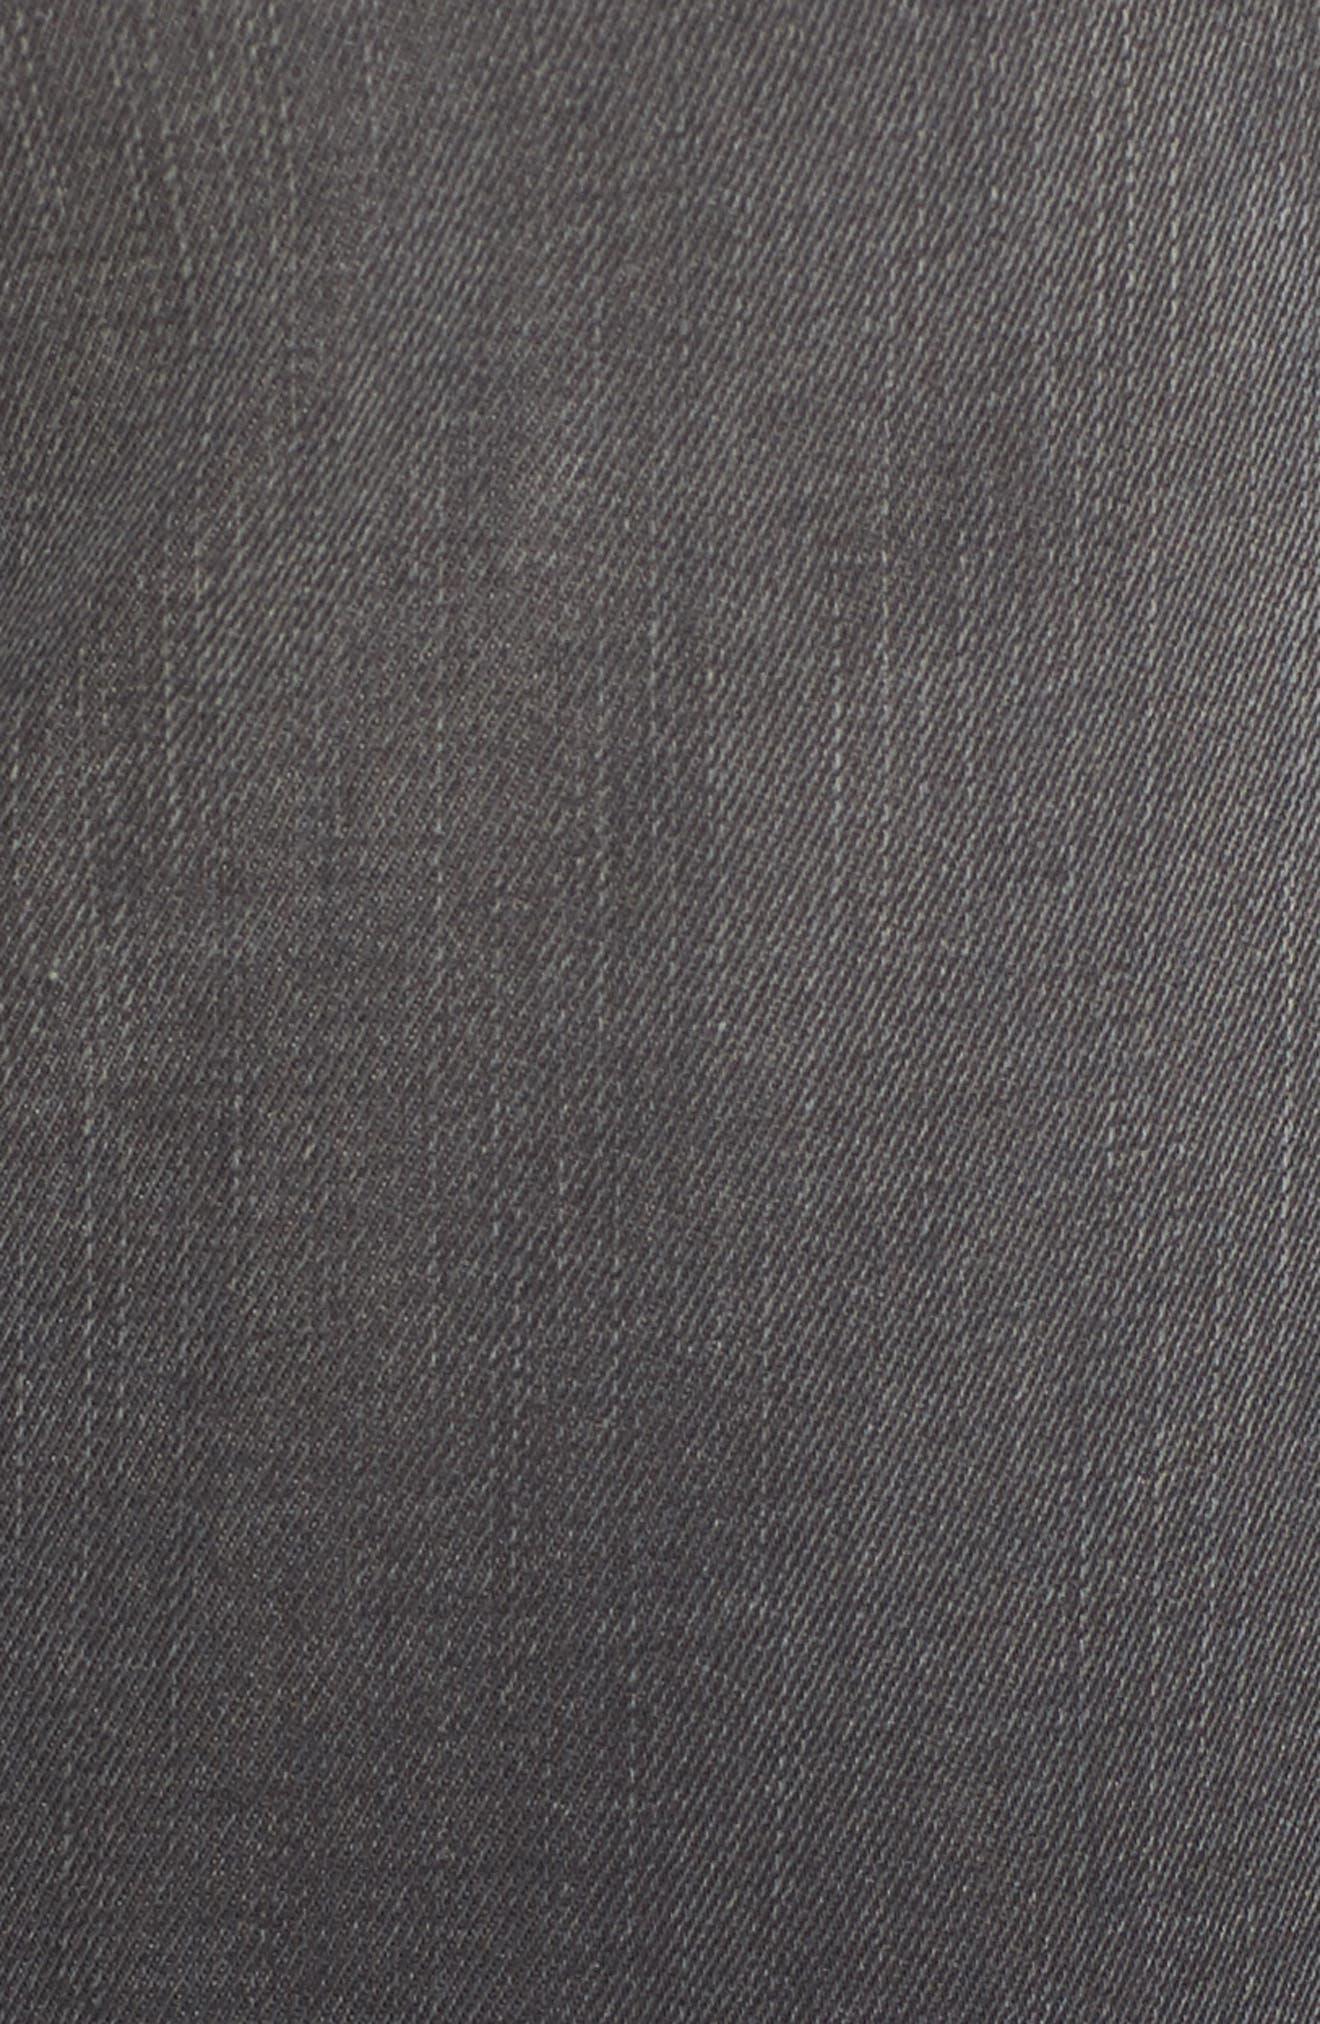 Alternate Image 5  - Leith Frayed Hem Skinny Jeans